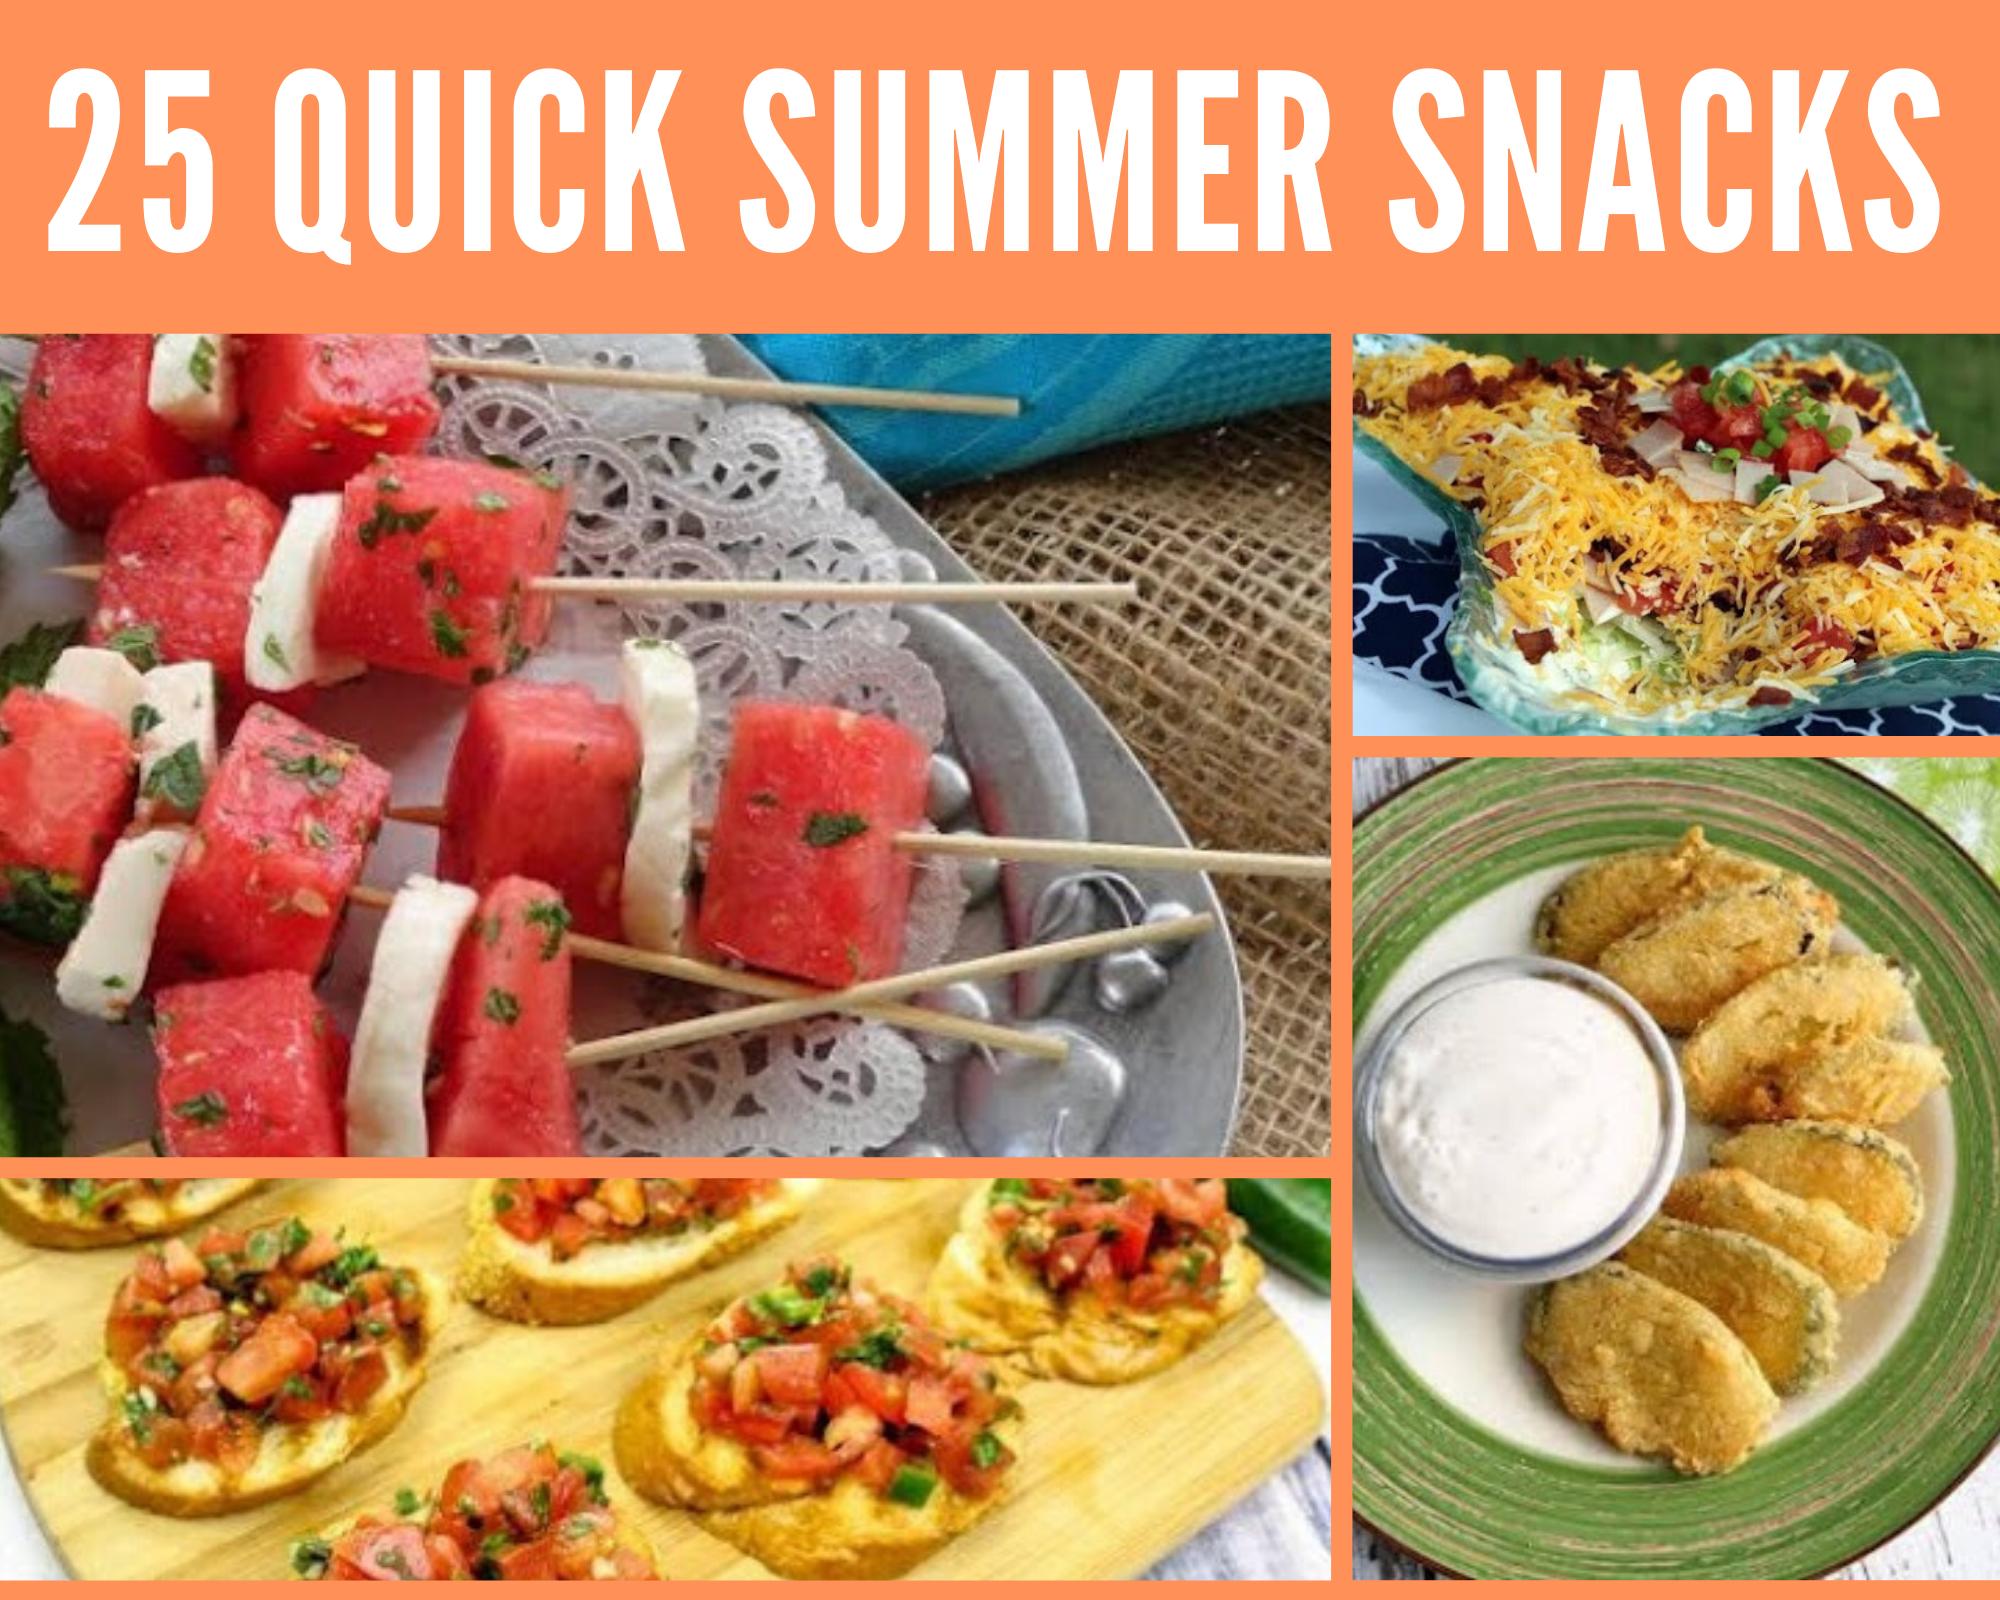 Fried pickles, taco dip, bruschetta and watermelon kabobs